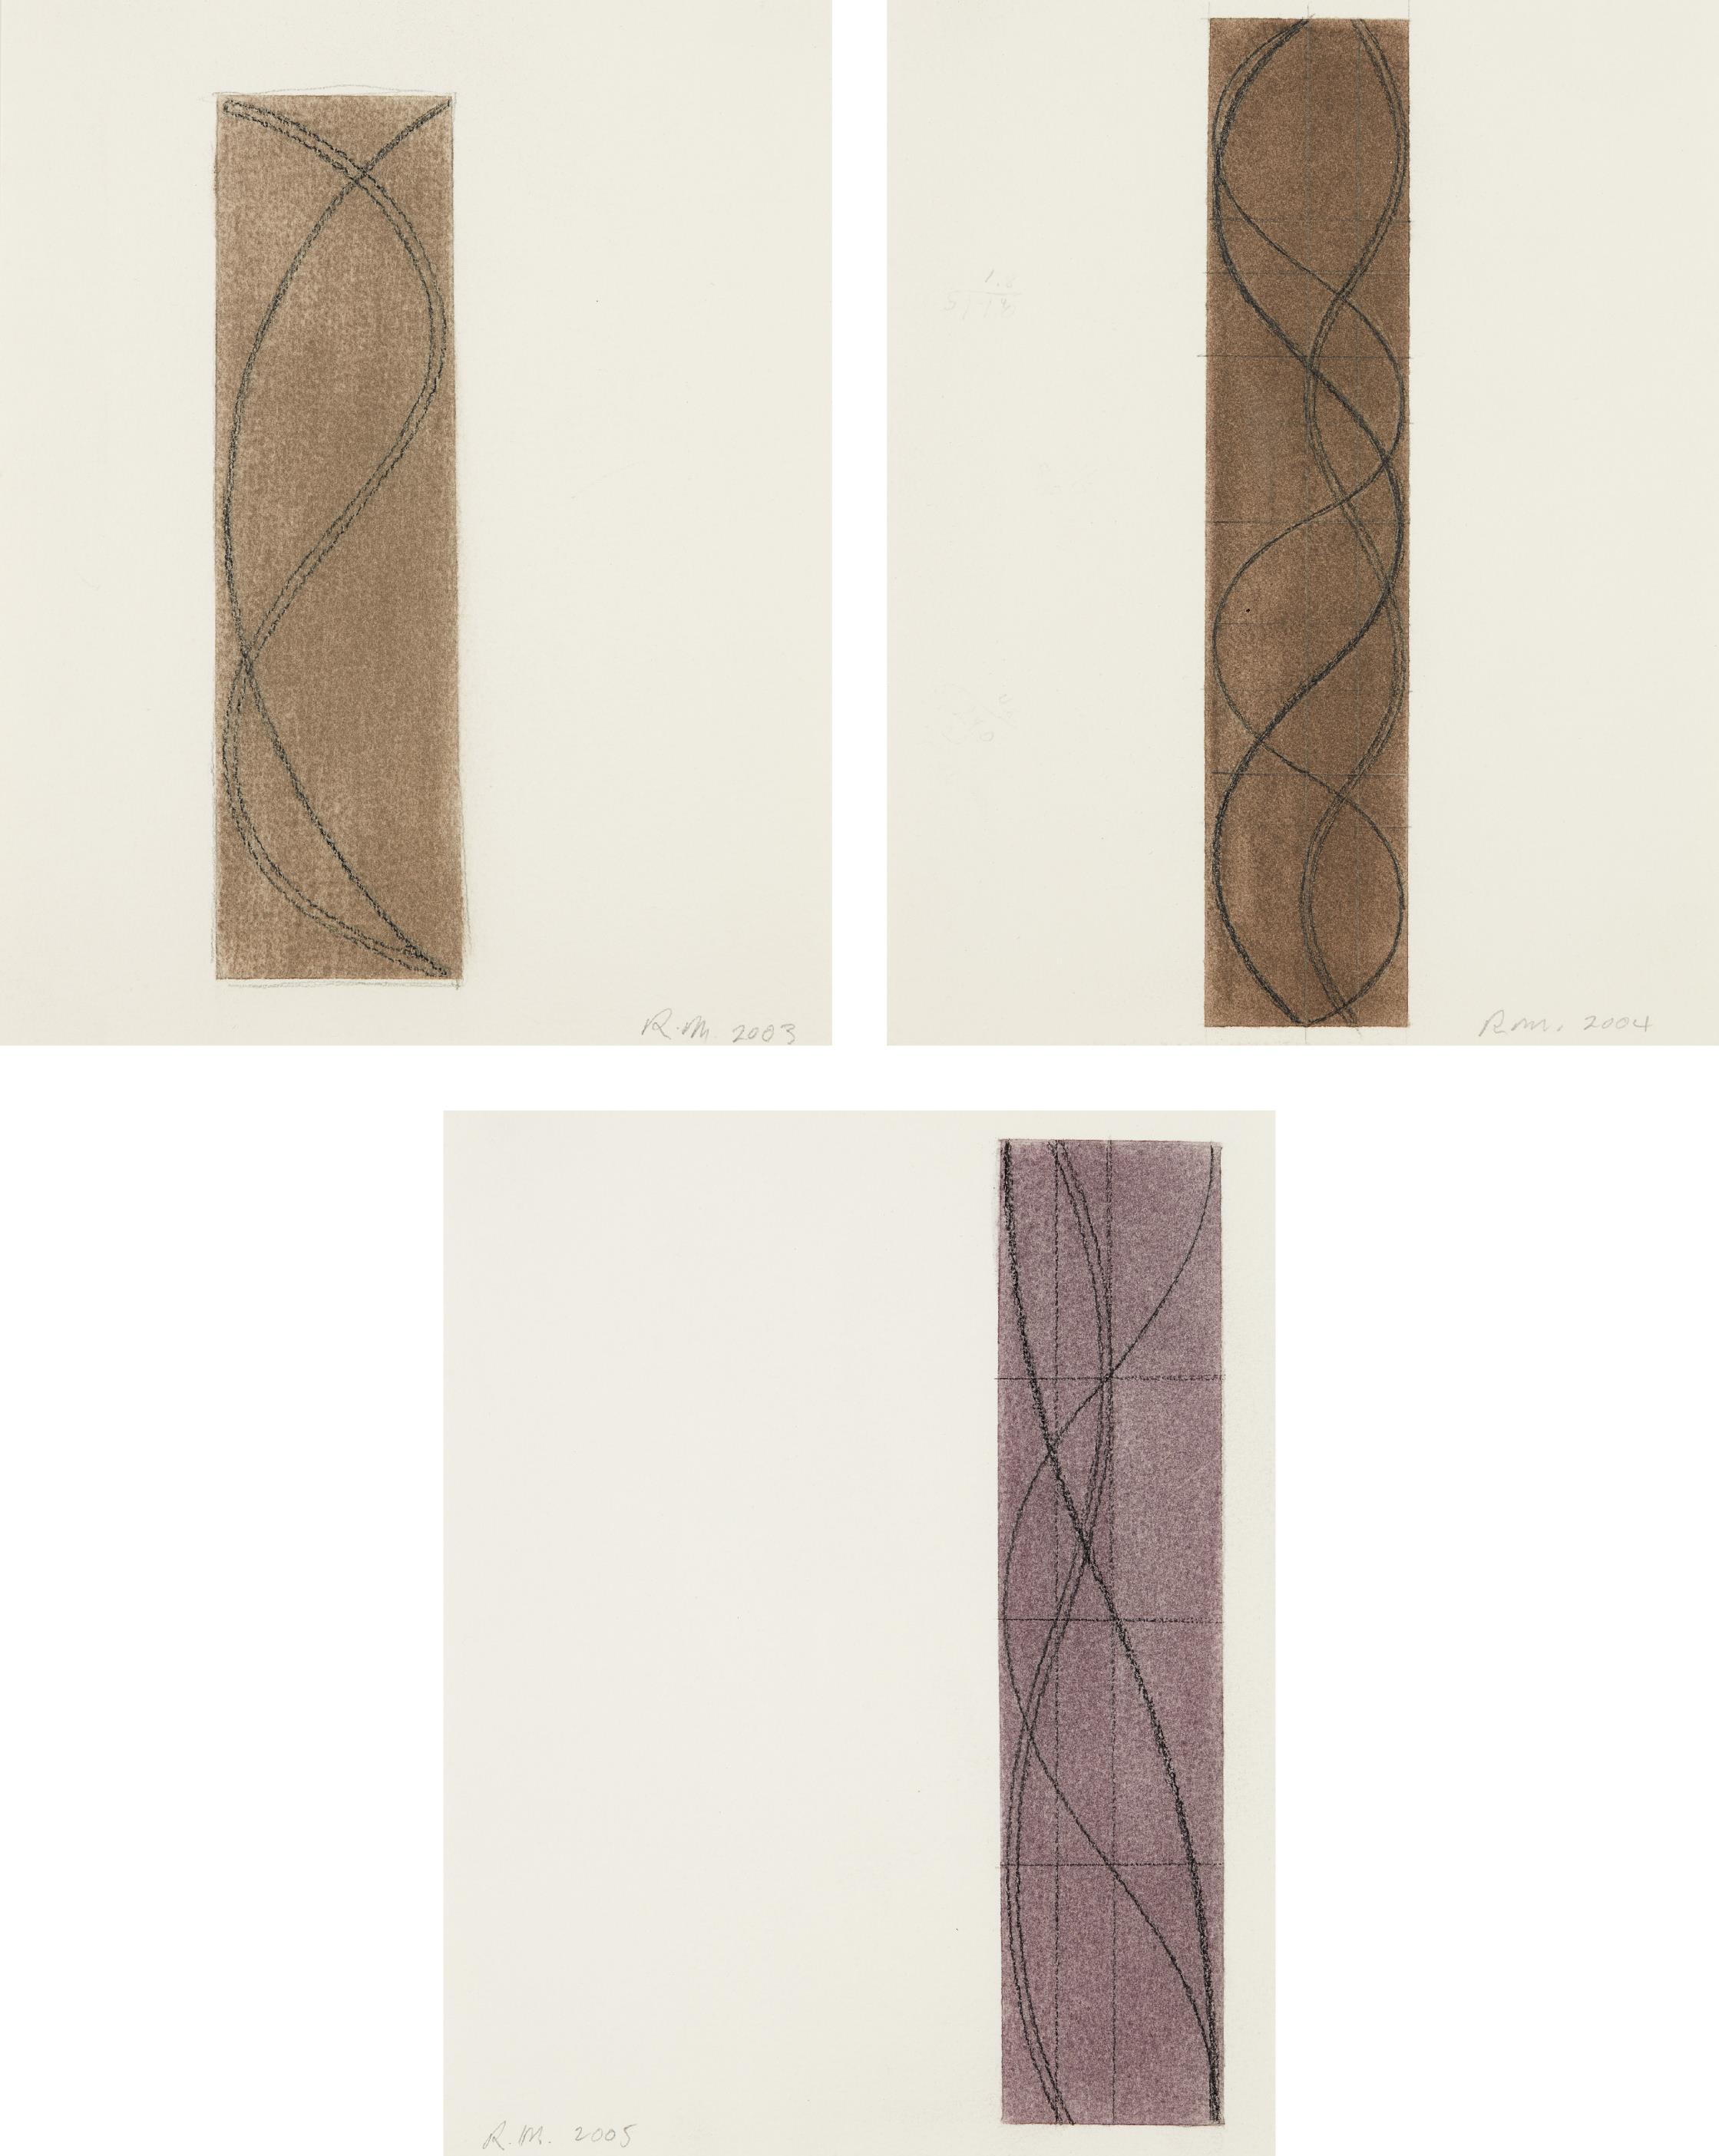 Robert Mangold-Untitled (Three Column drawings)-2005